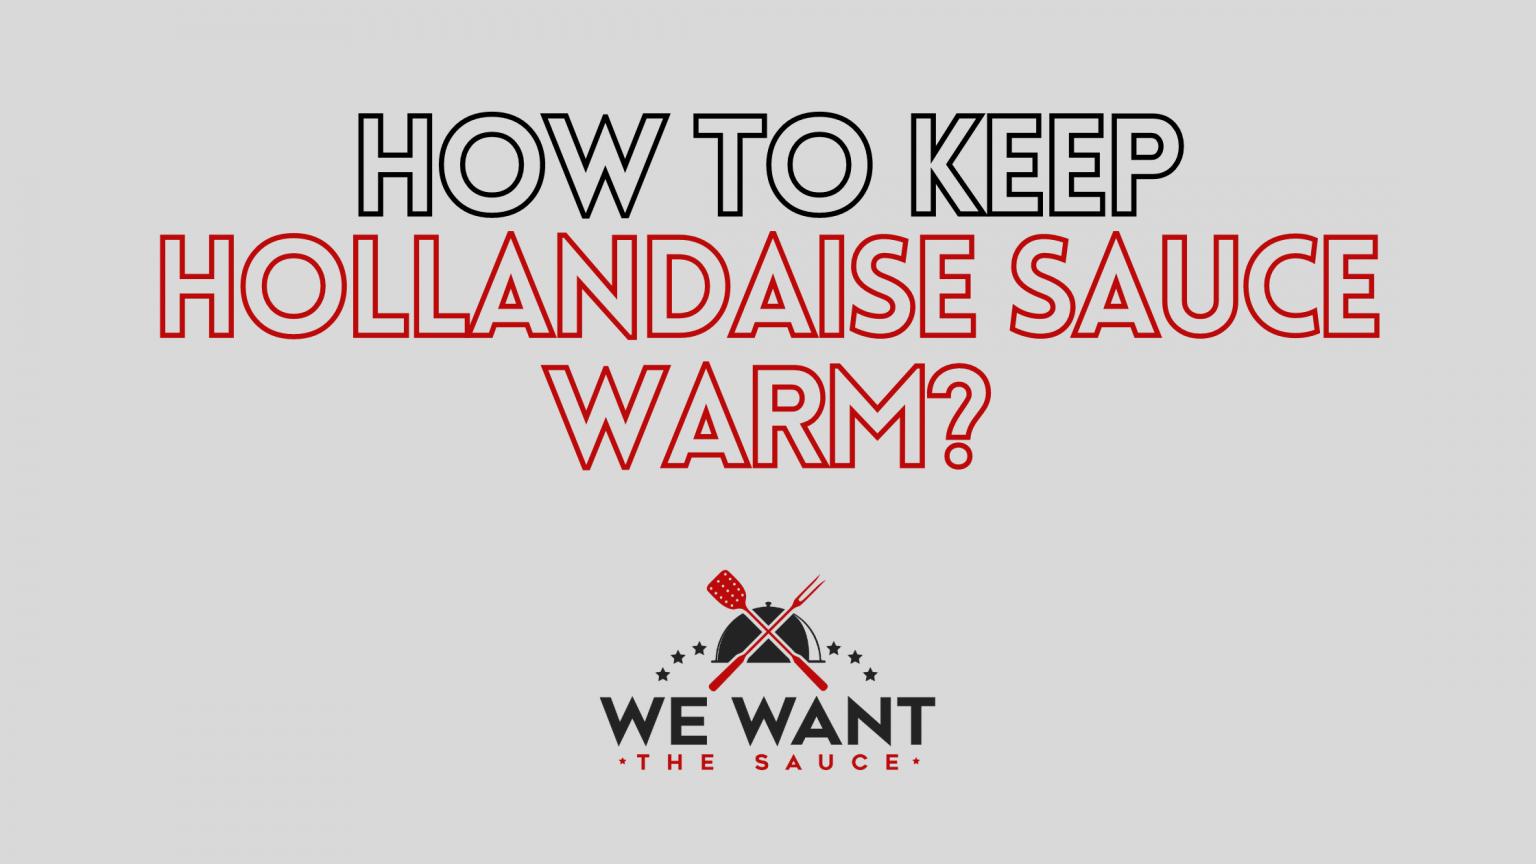 How To Keep Hollandaise Sauce Warm